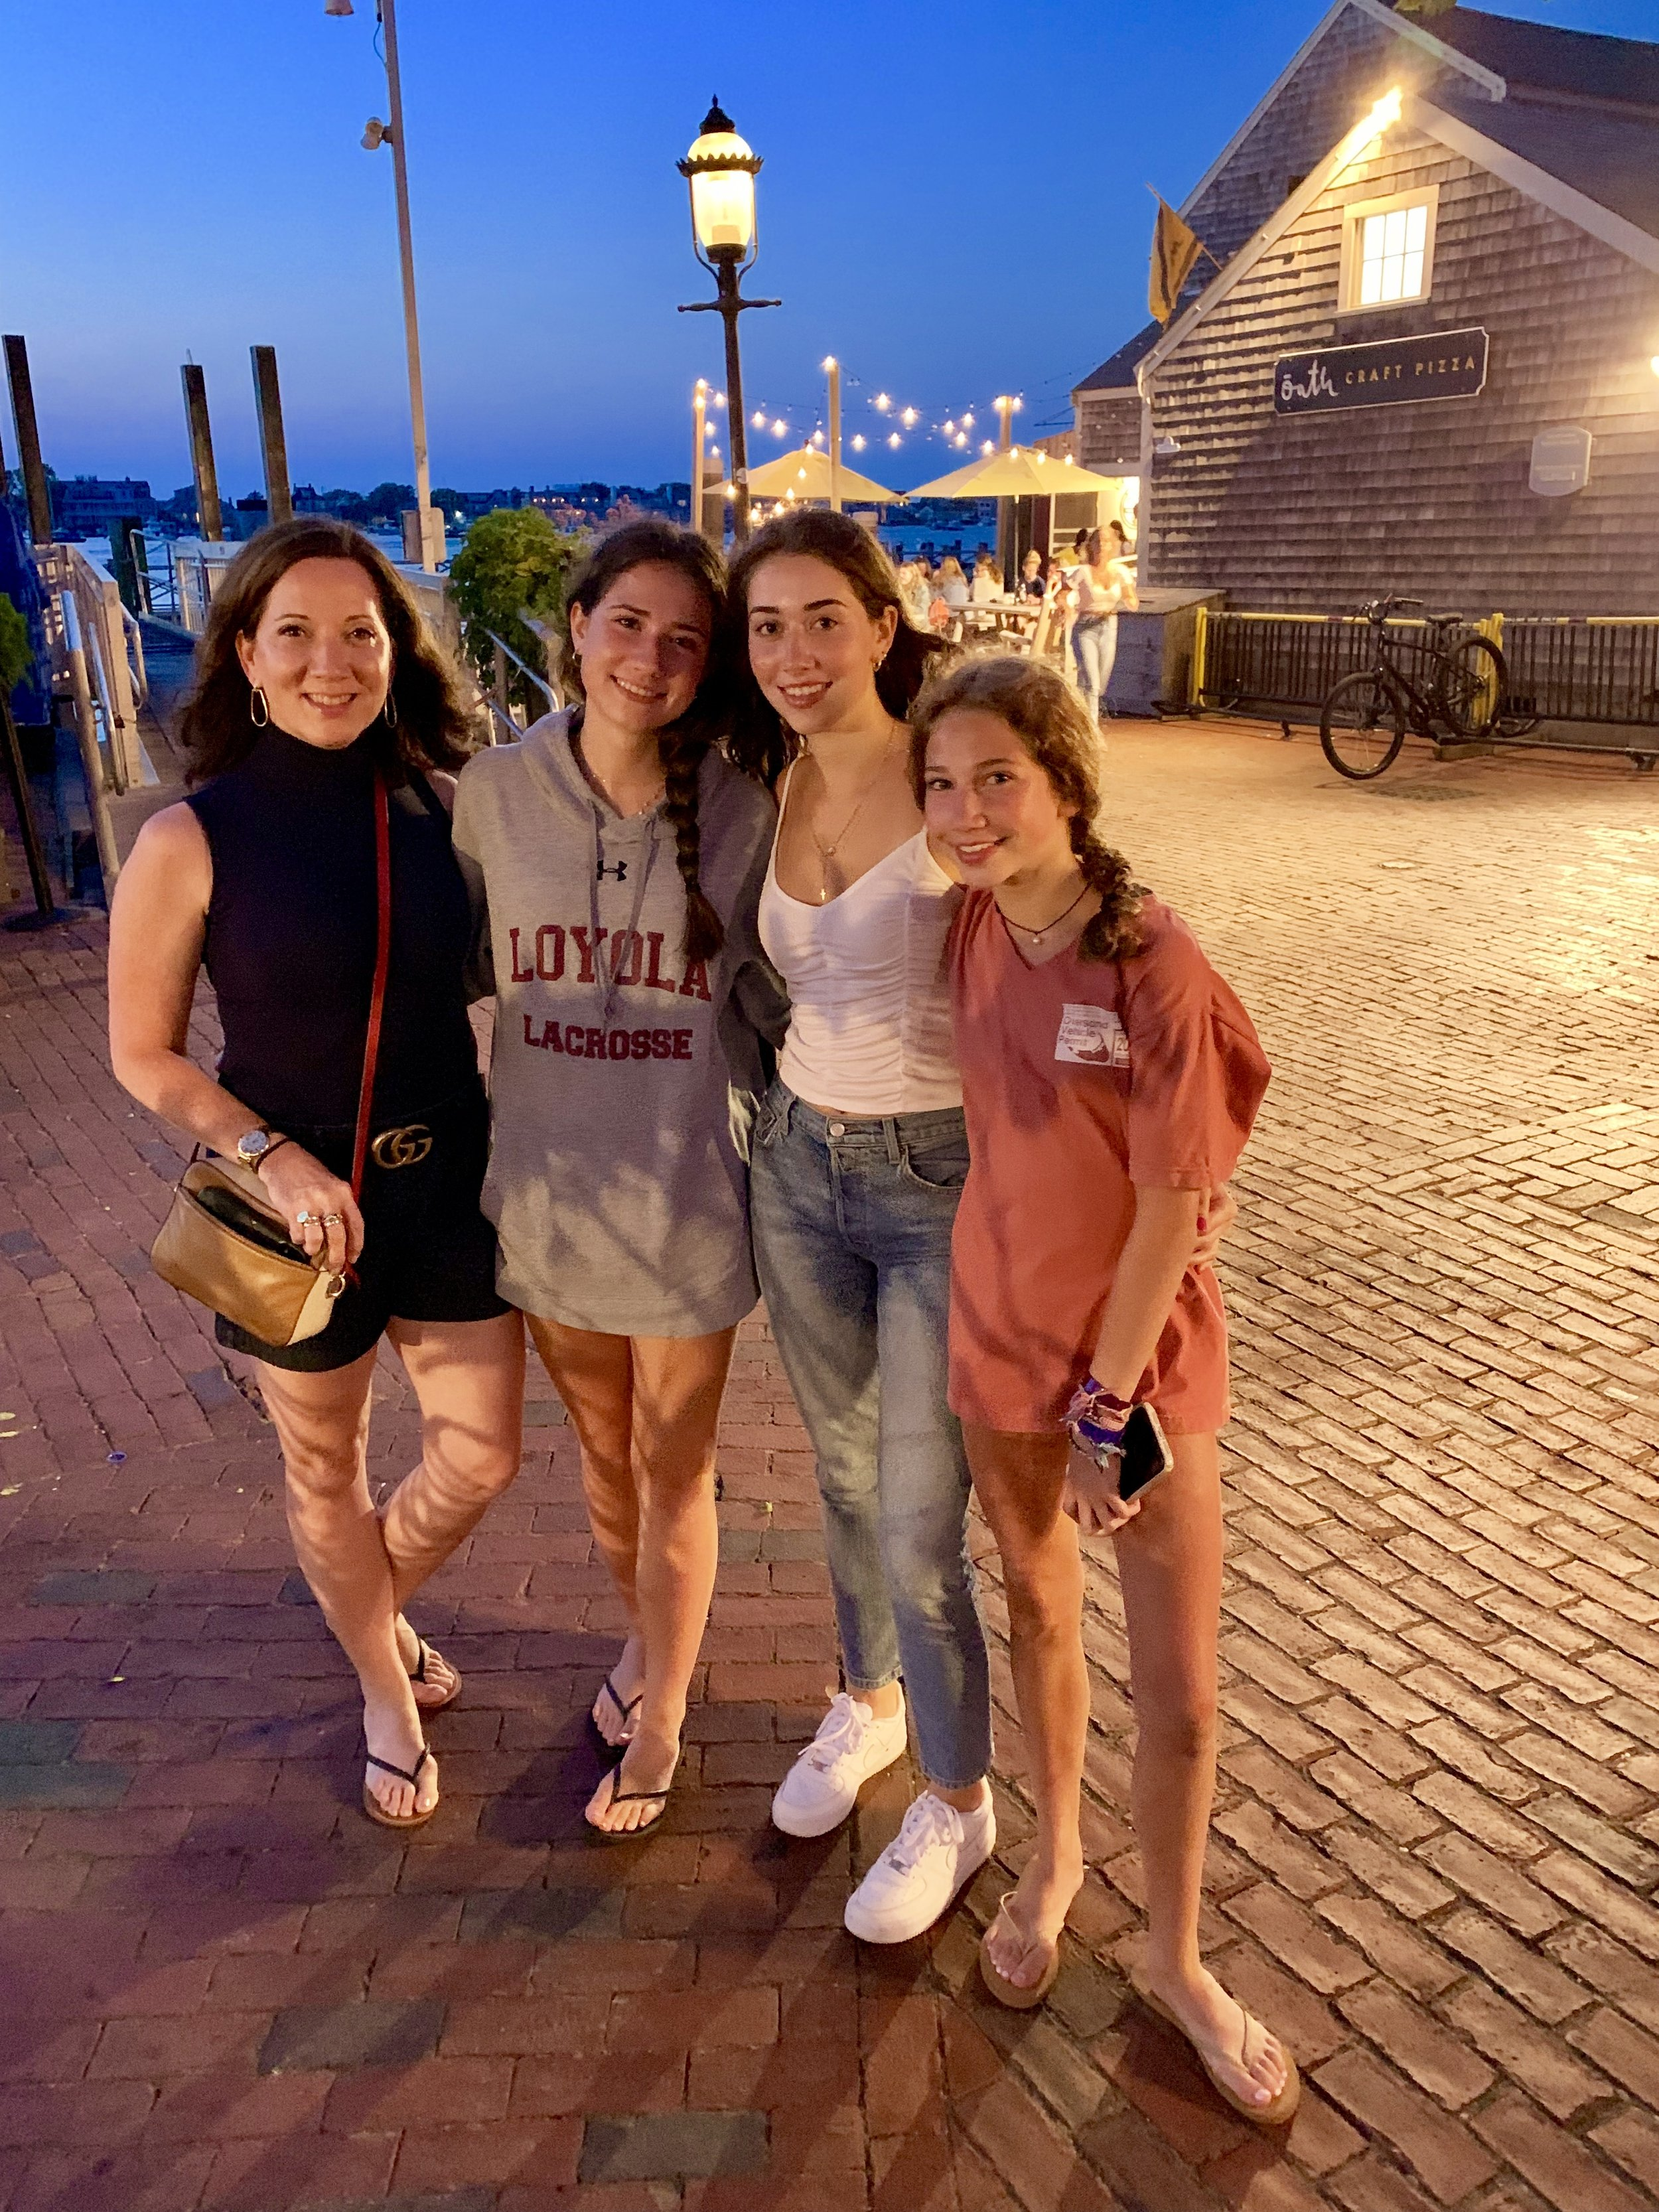 { My 3 girls Petrea, Mira & Alexa}